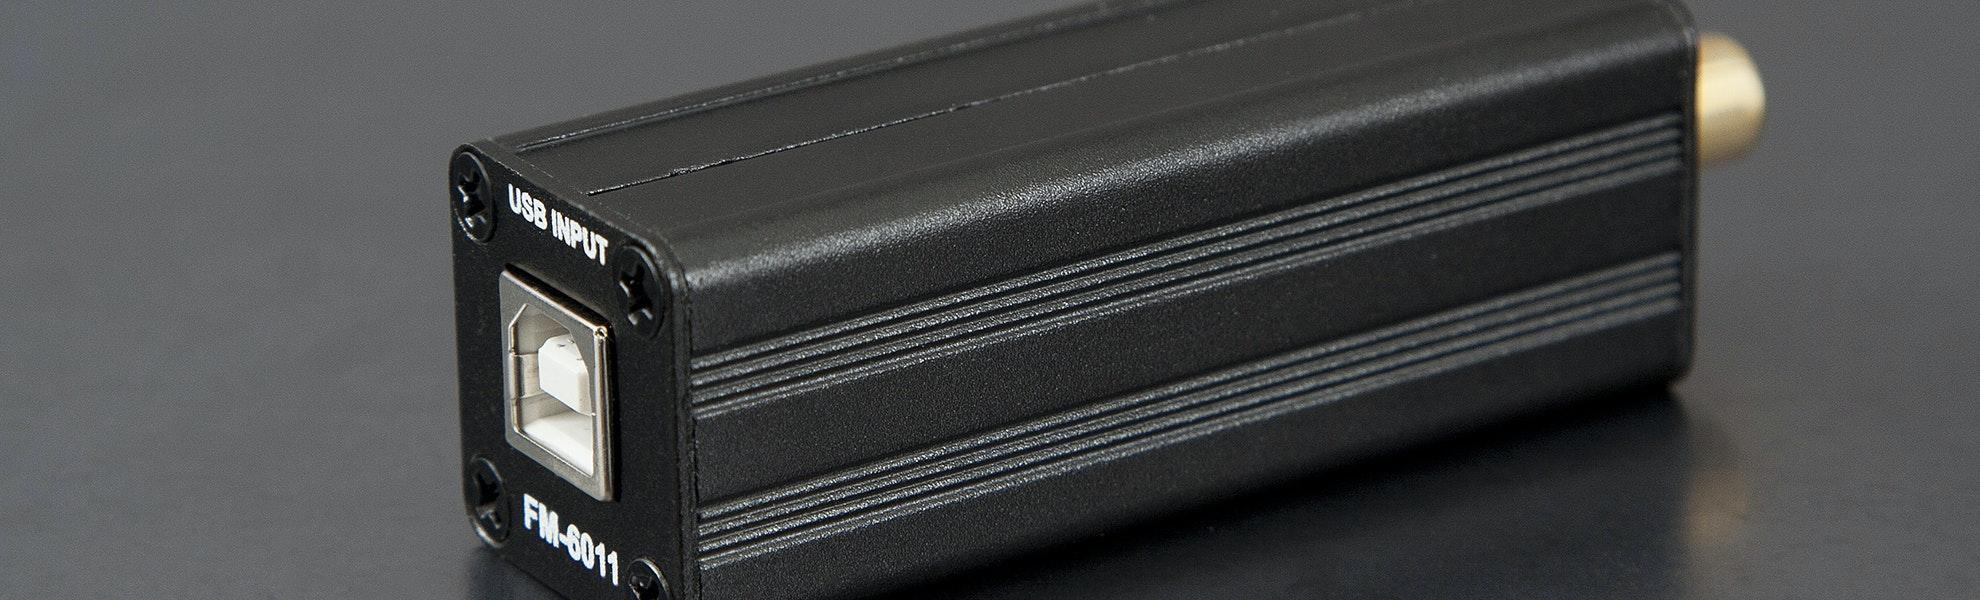 Fanmusic FM-6011 USB-to-SPDIF Converter